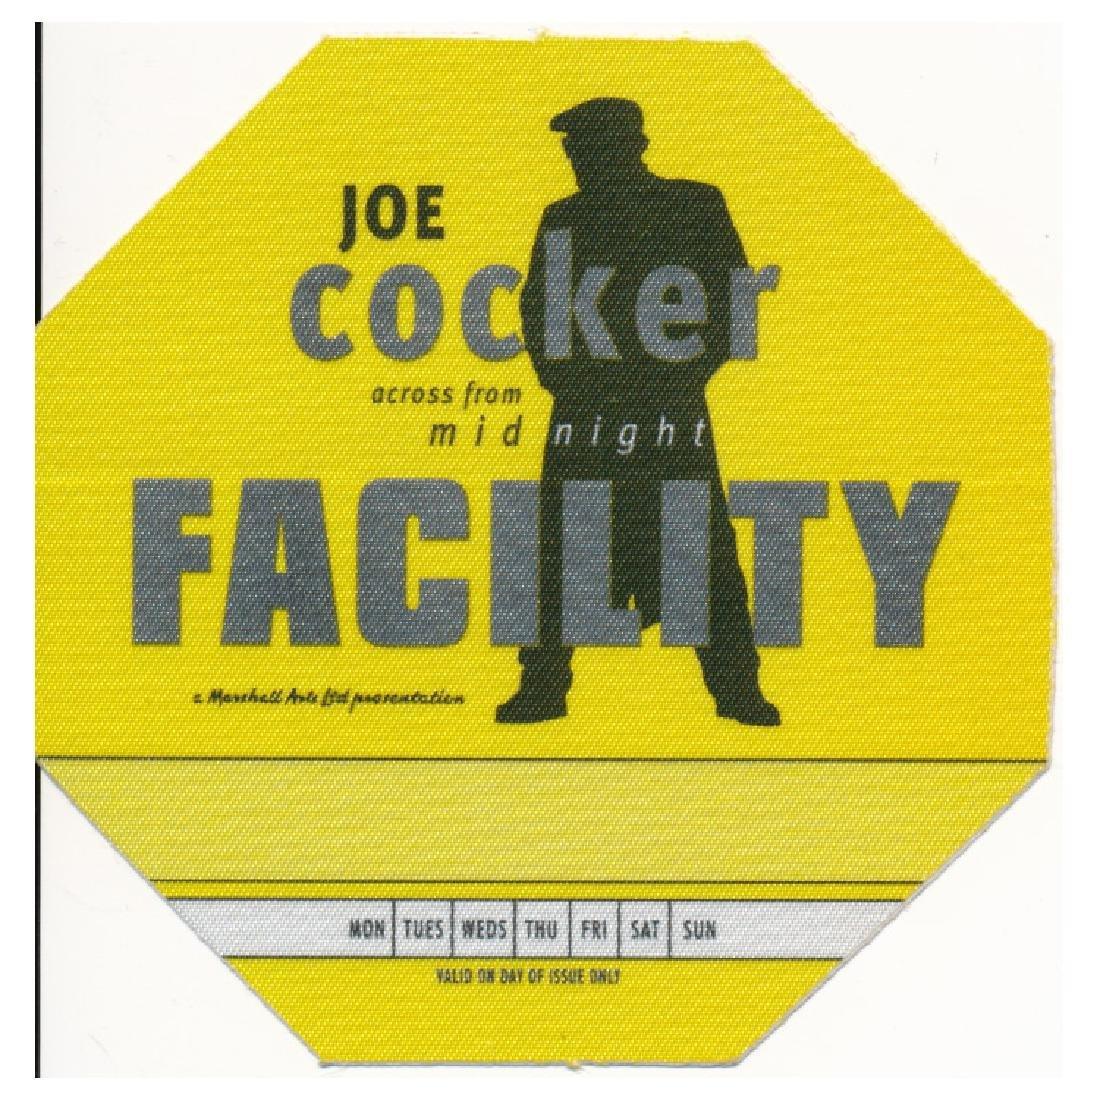 Joe Cocker - 1997 Backstage Pass